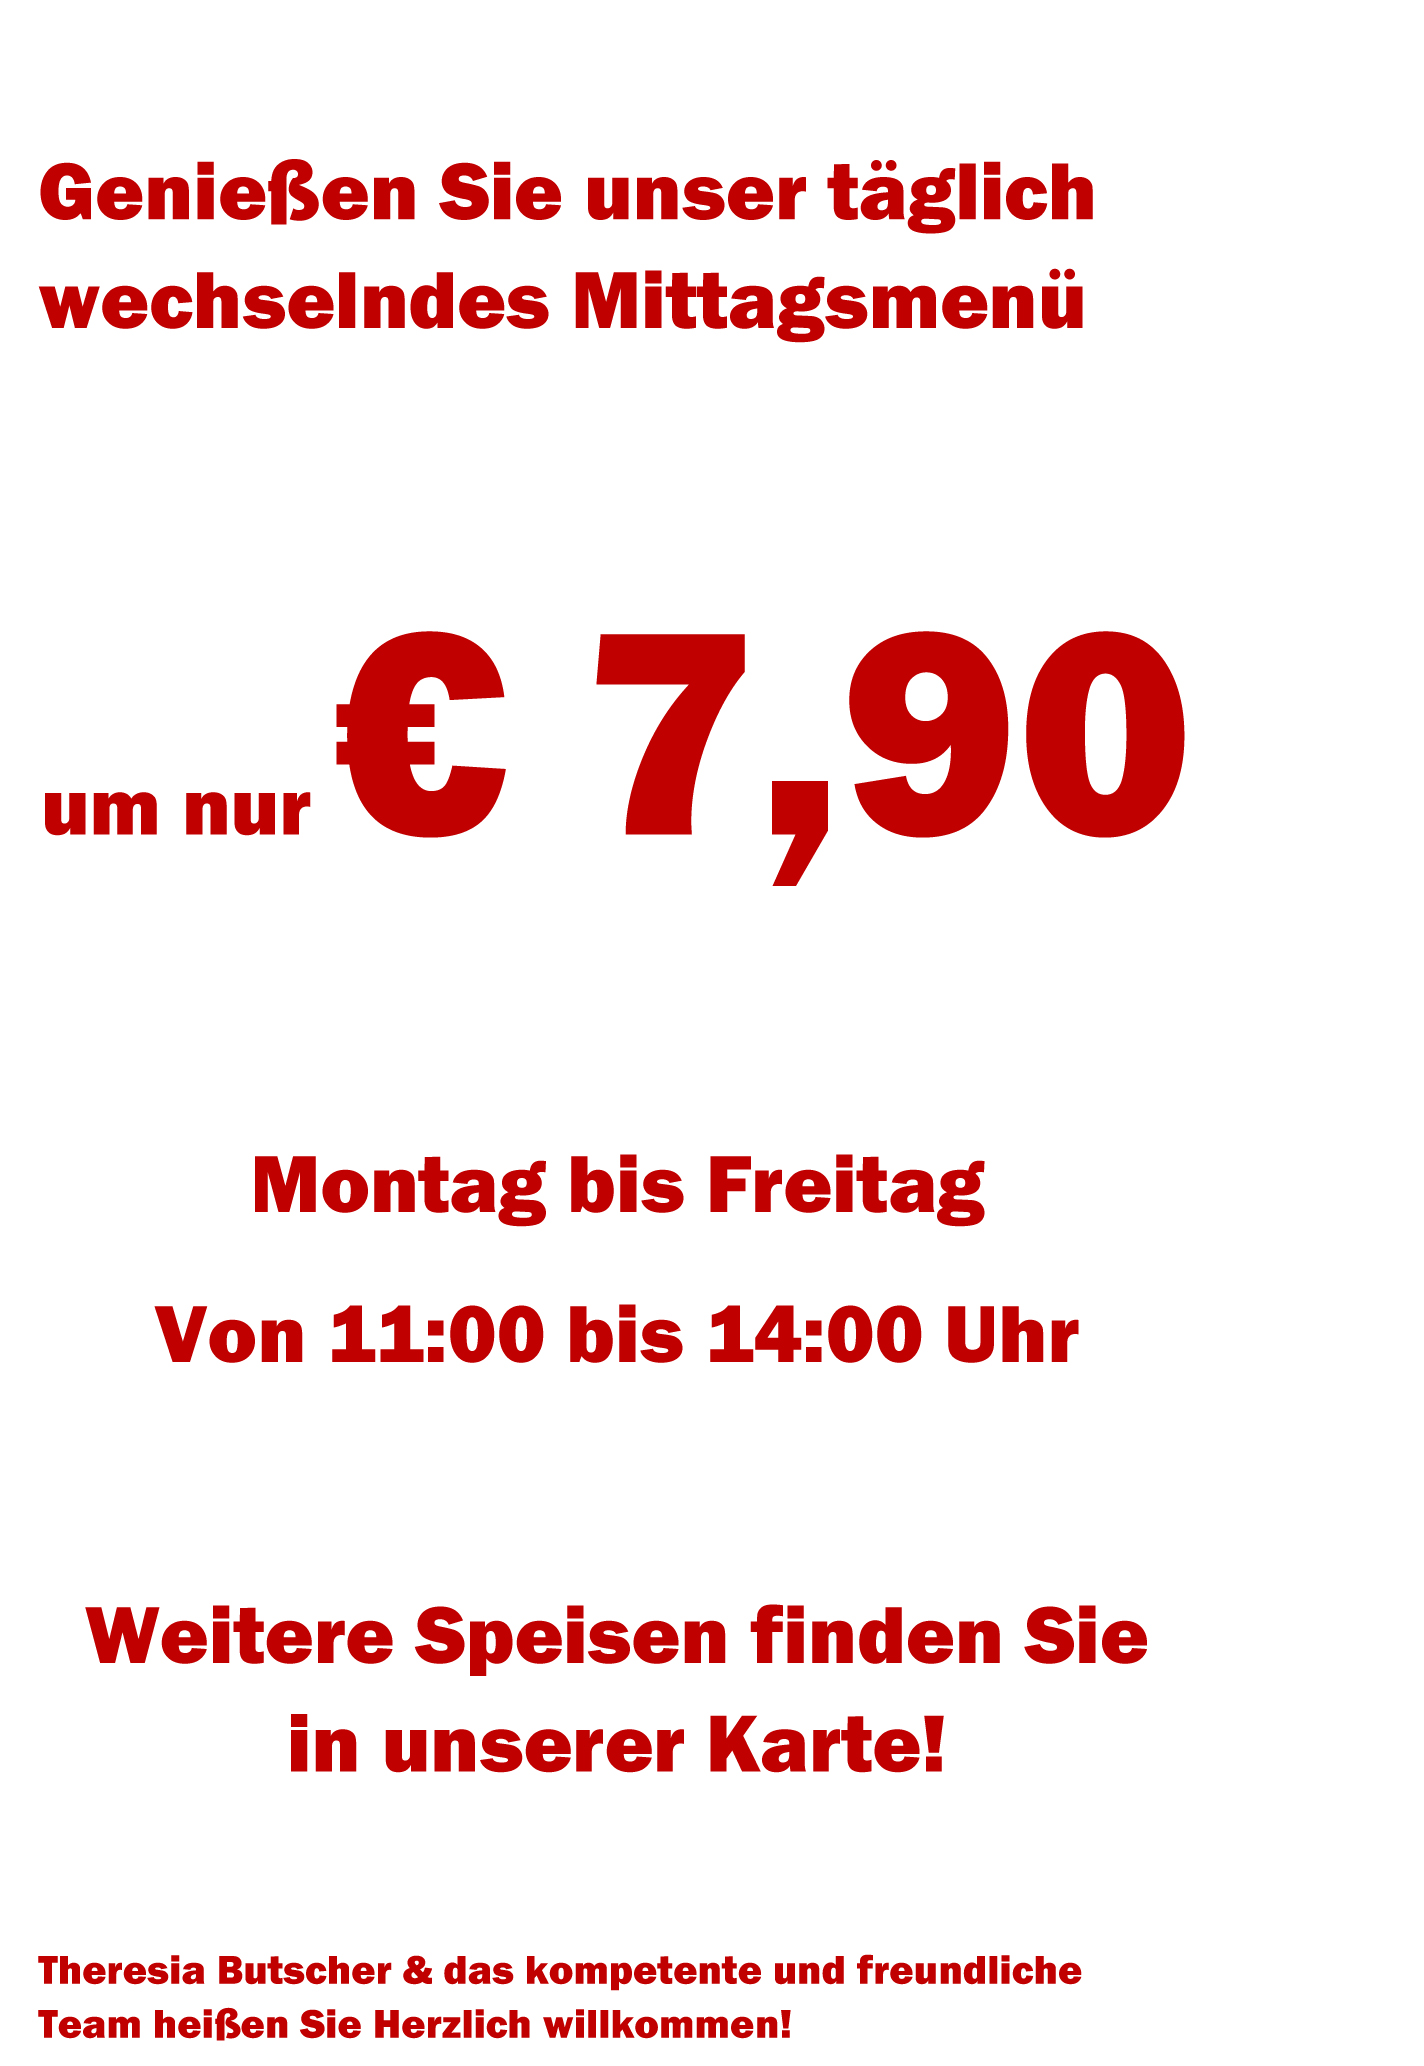 Microsoft Word - Speisekarte Kappel - mit Allergenen-Jause-01.01